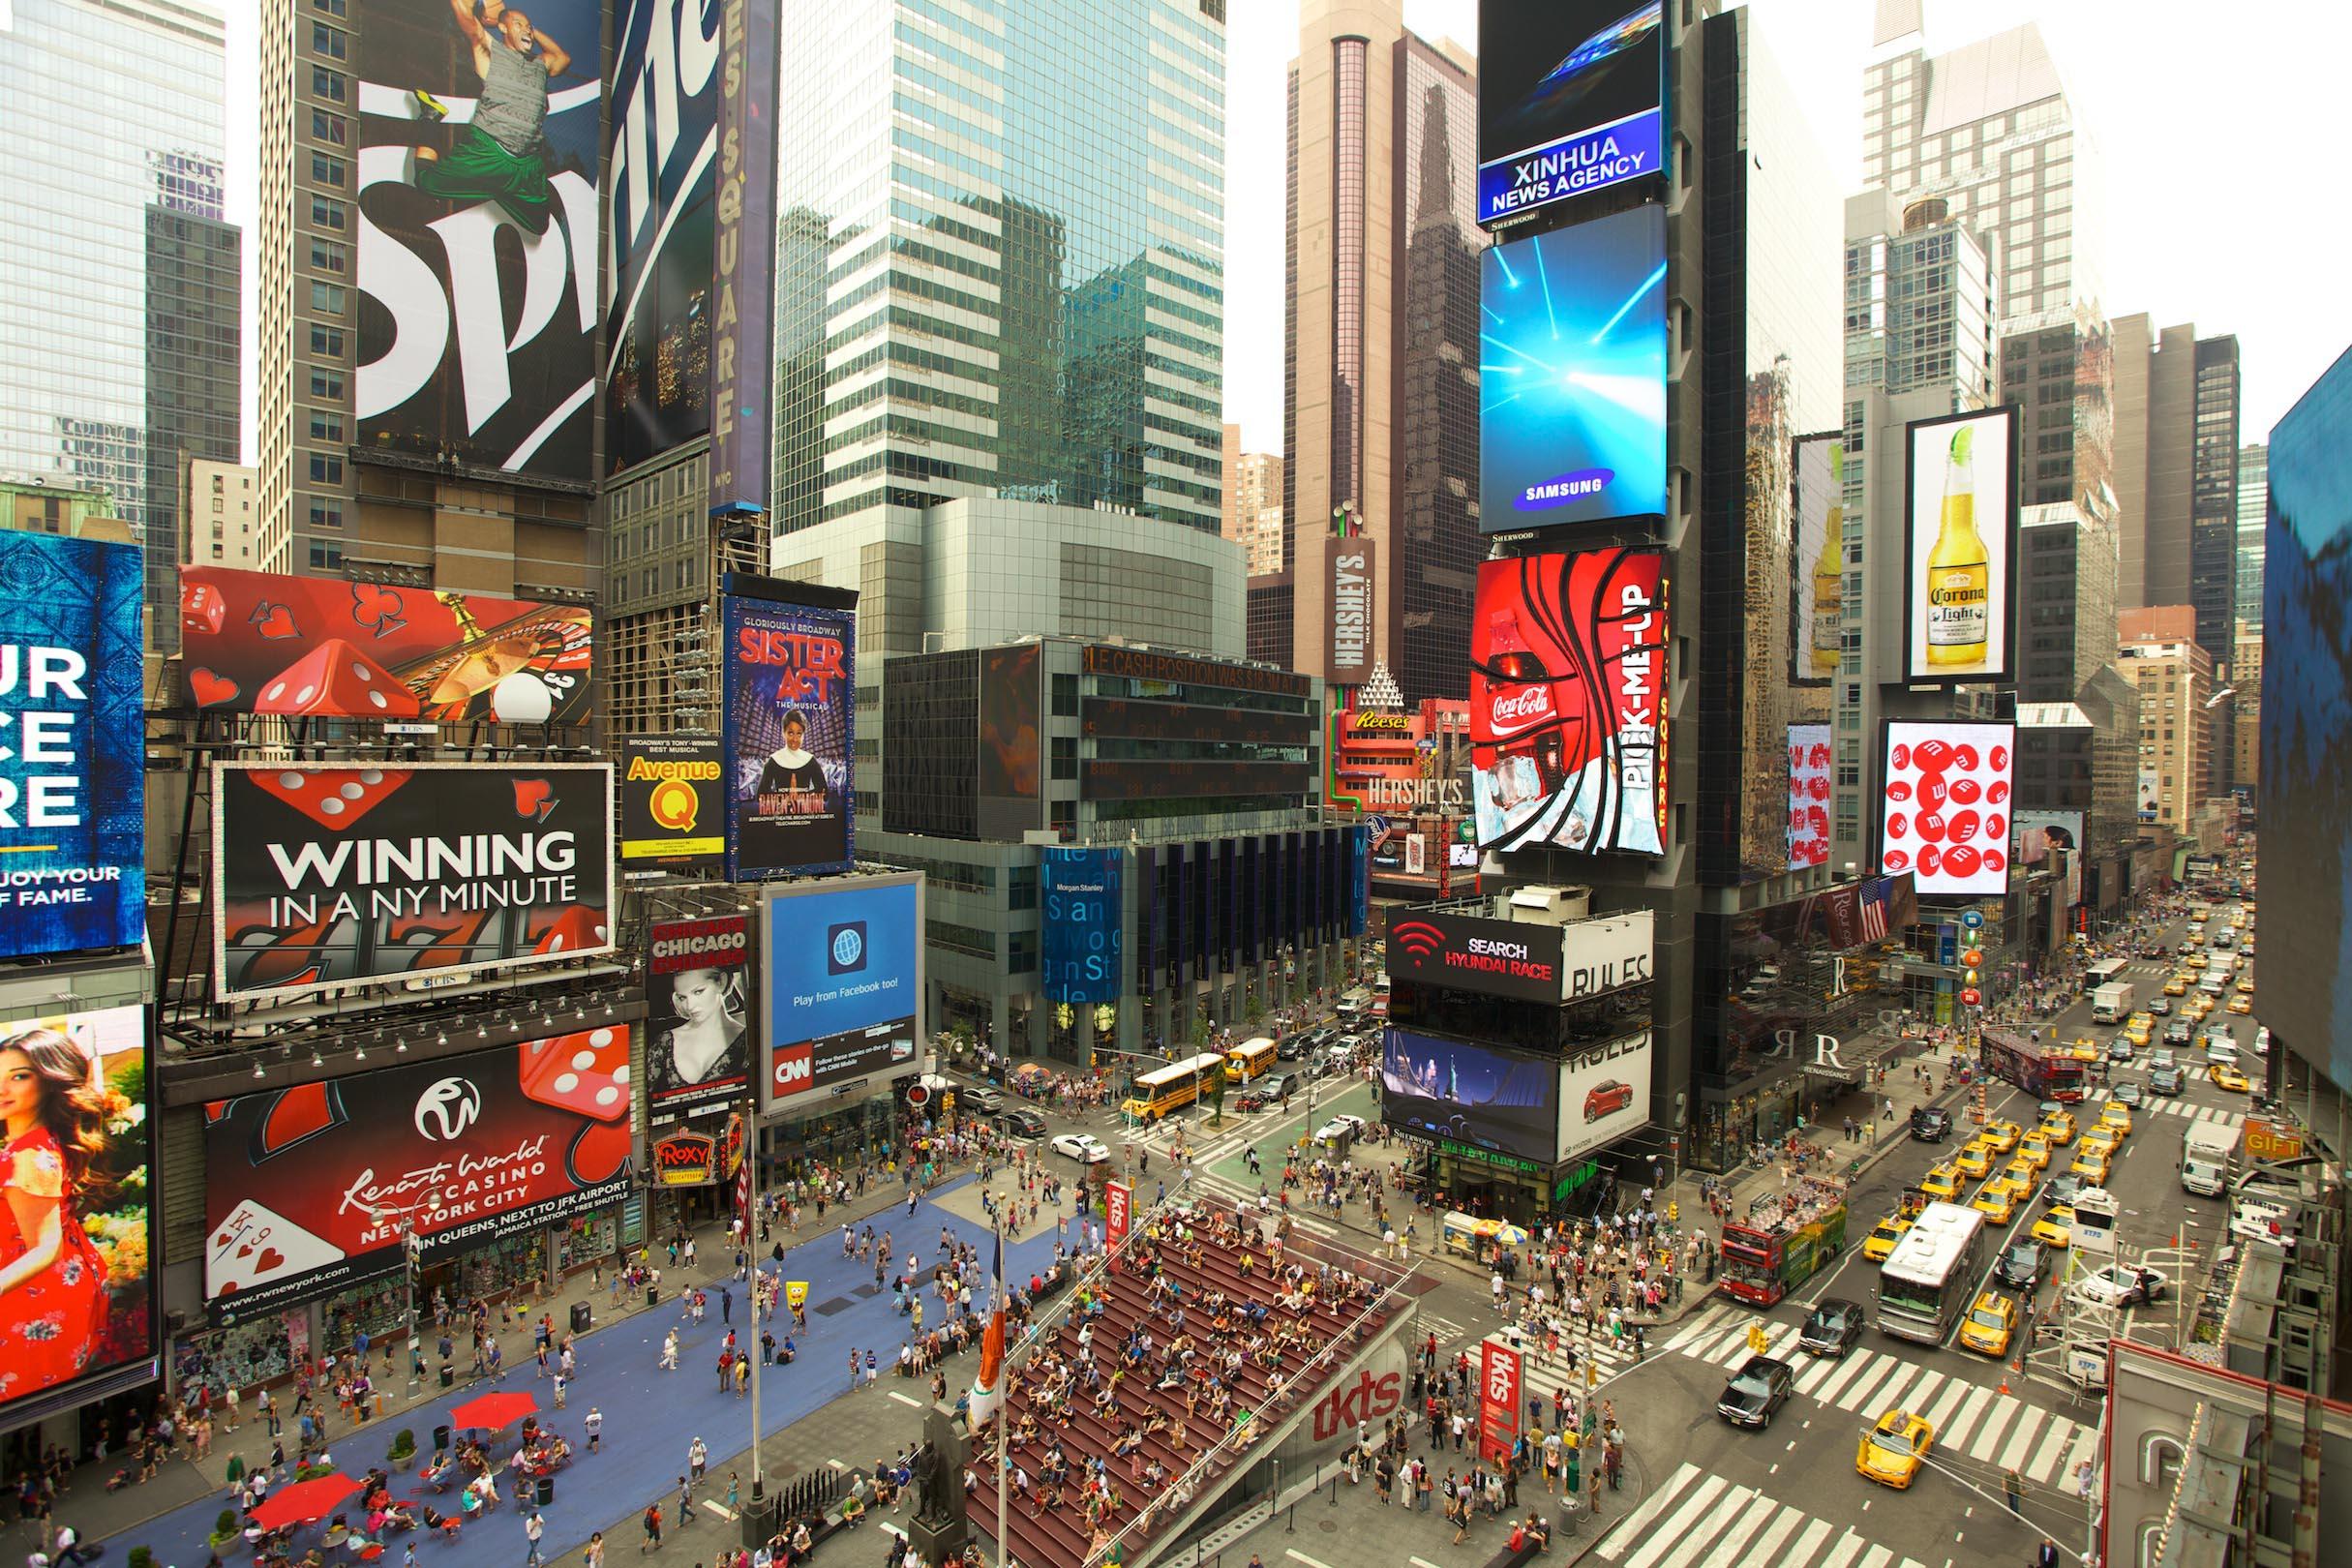 Les Evenements Les Plus Populaires De New York Expedia Ca Fr